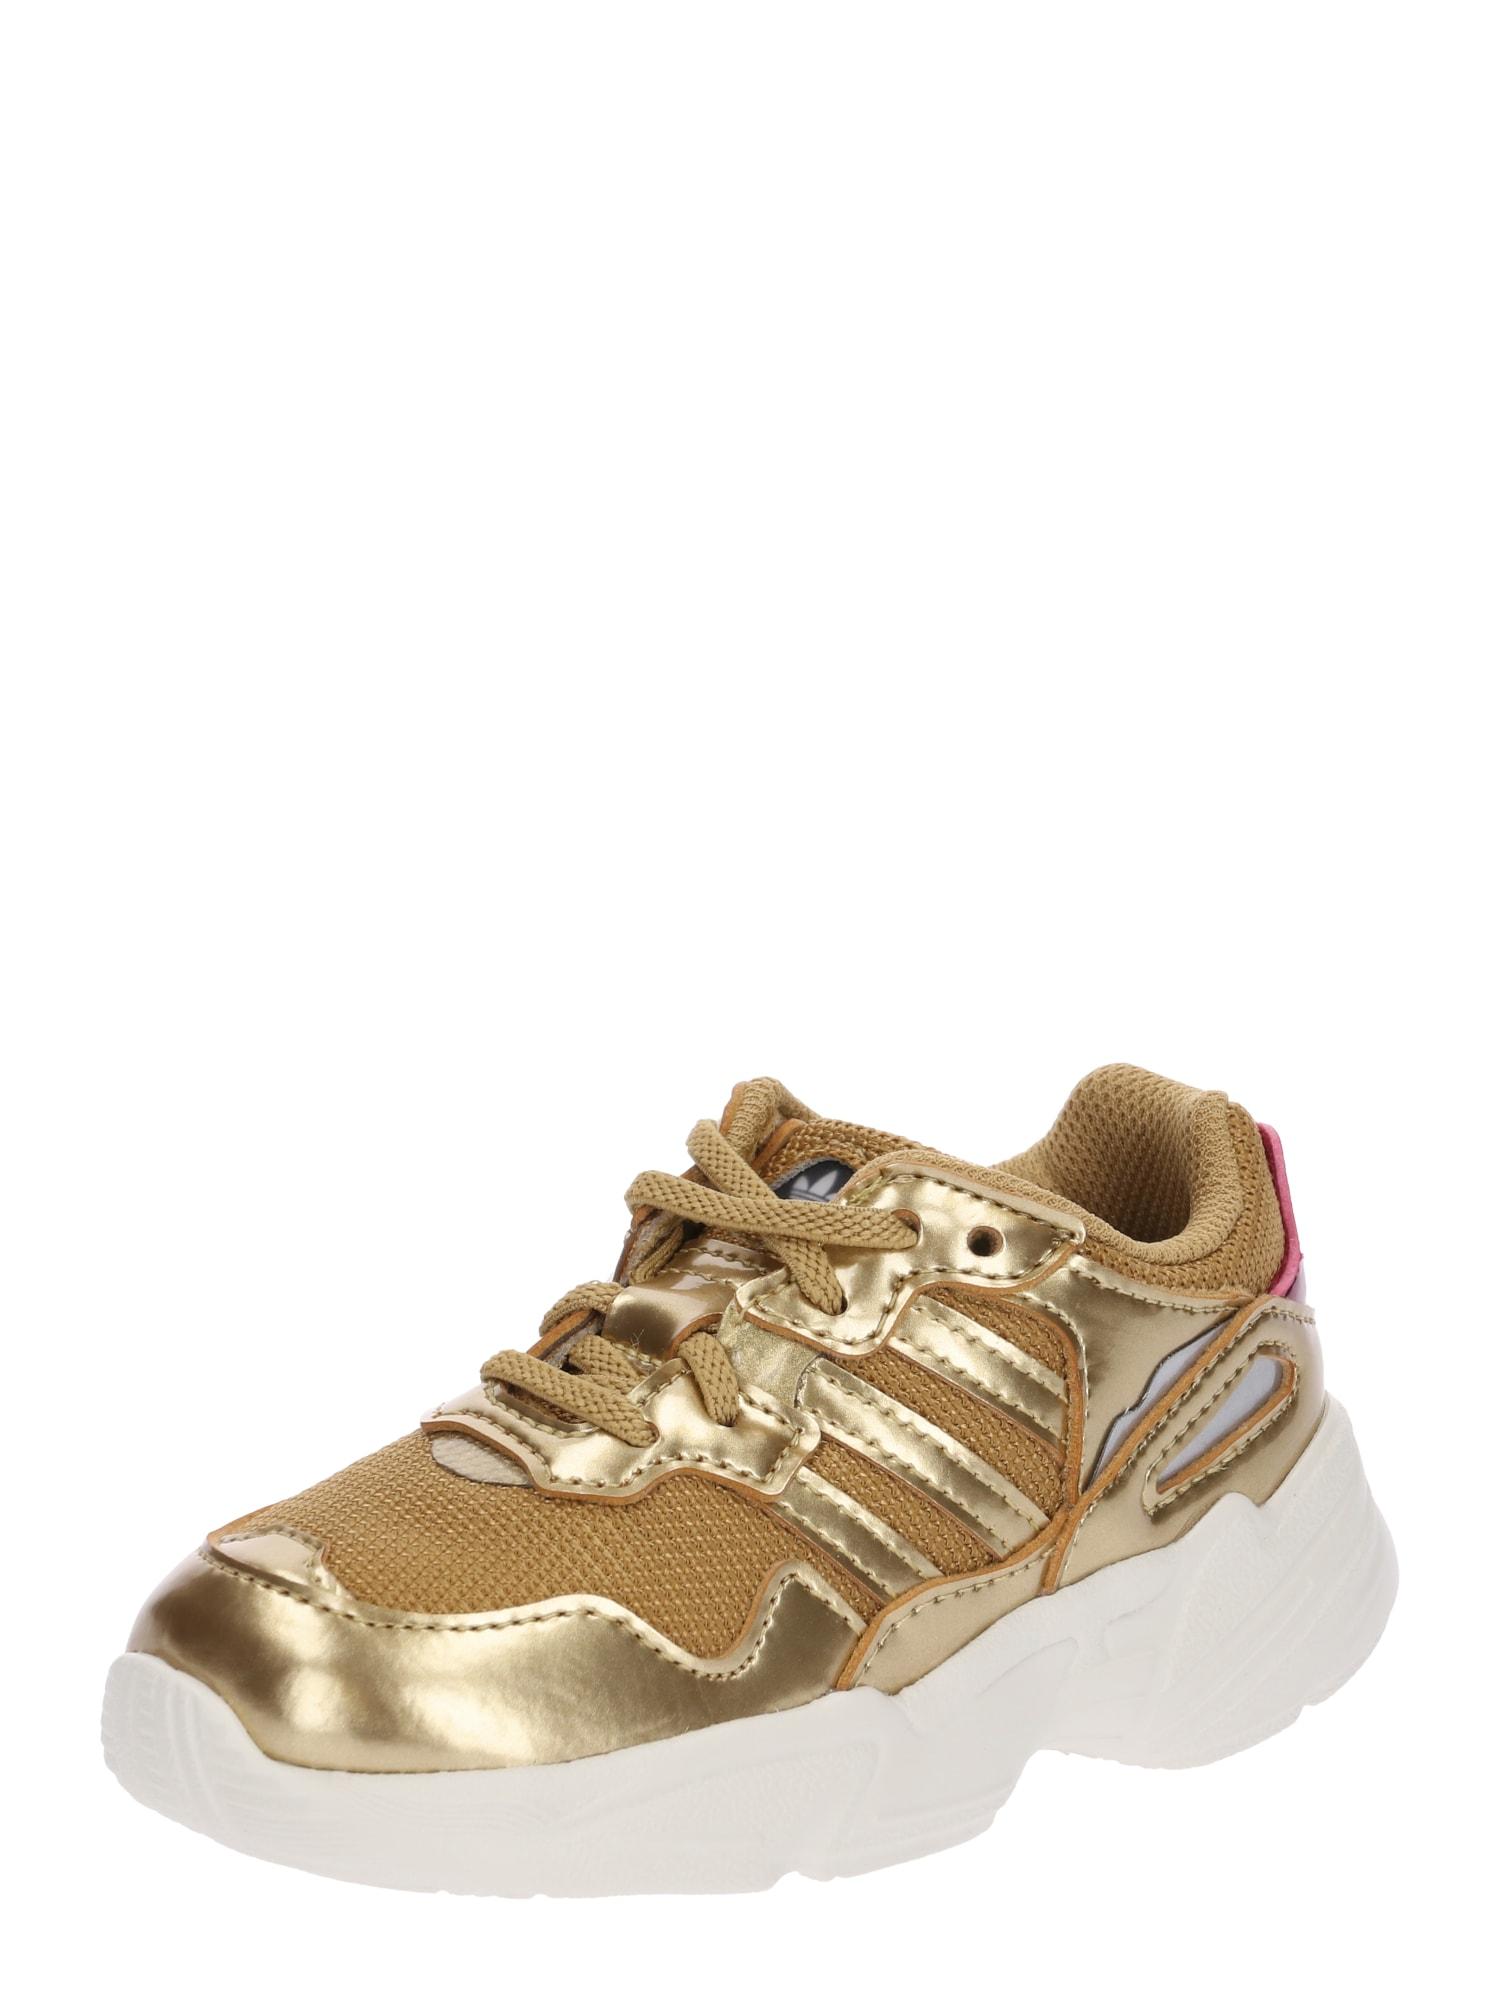 ADIDAS ORIGINALS, Meisjes Sneakers 'YUNG-96 EL I', goud